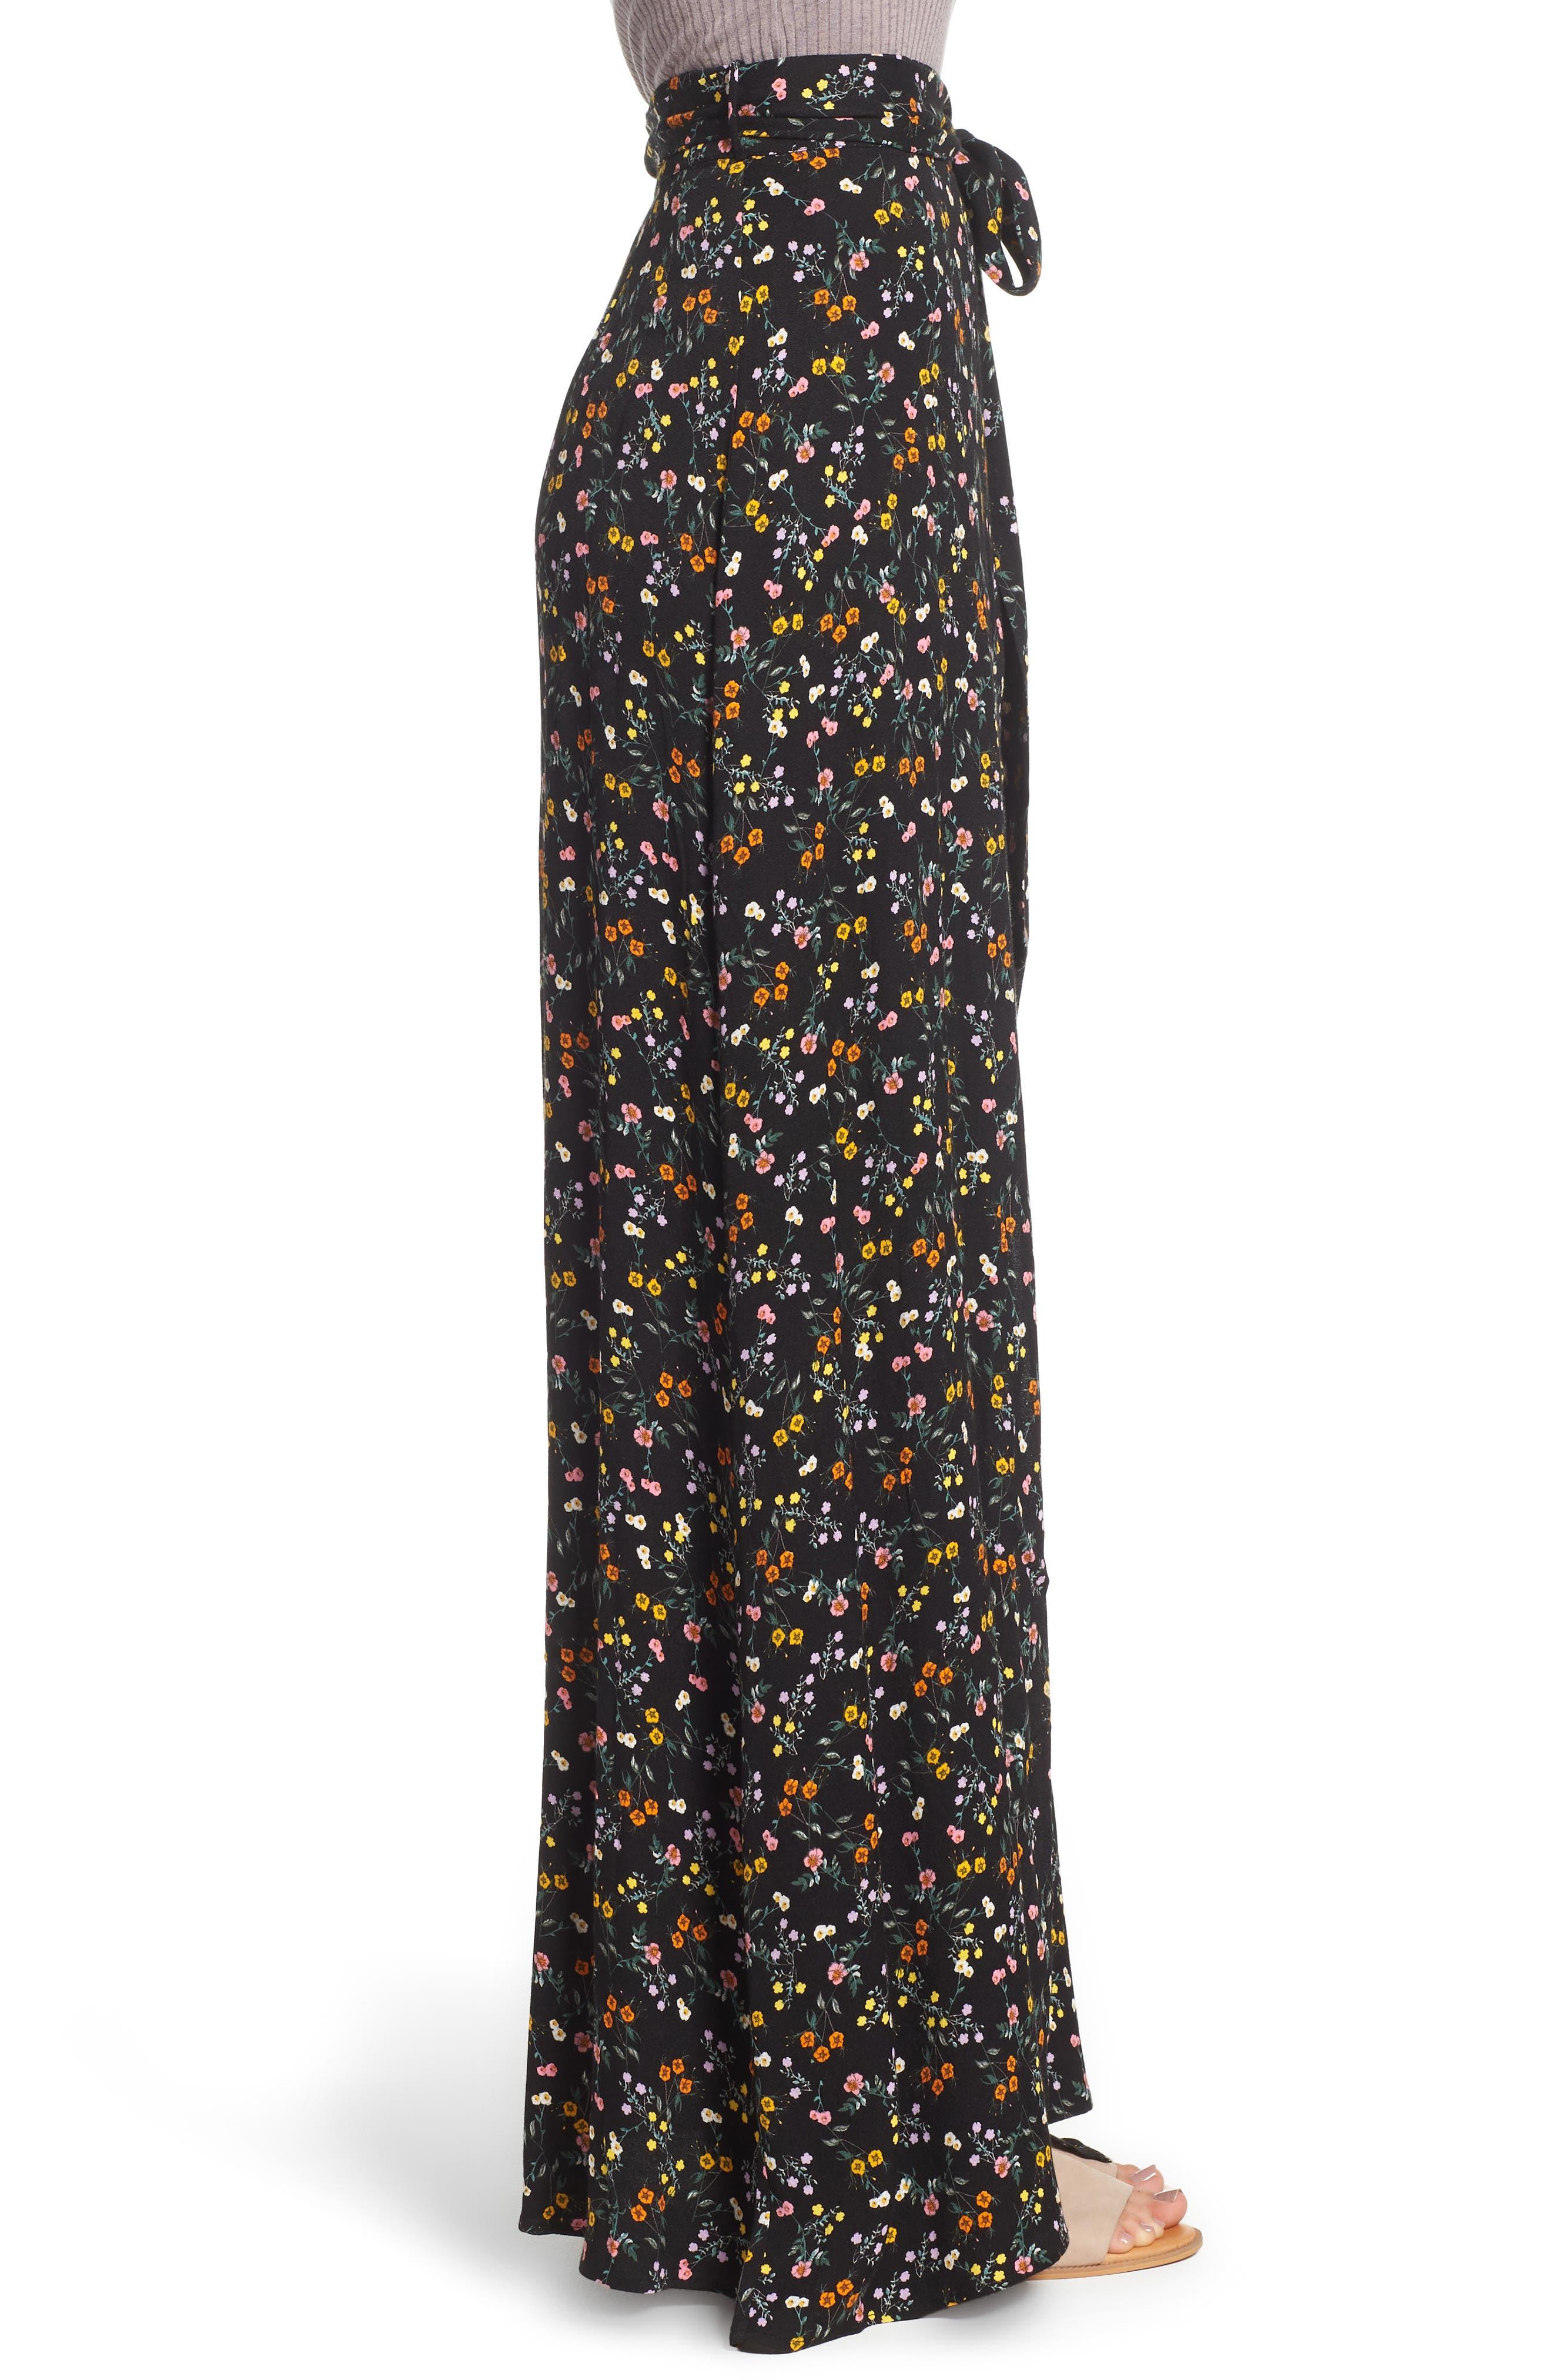 Alessandra Maxi Skirt,                             Alternate thumbnail 3, color,                             Noir Petite Fleur